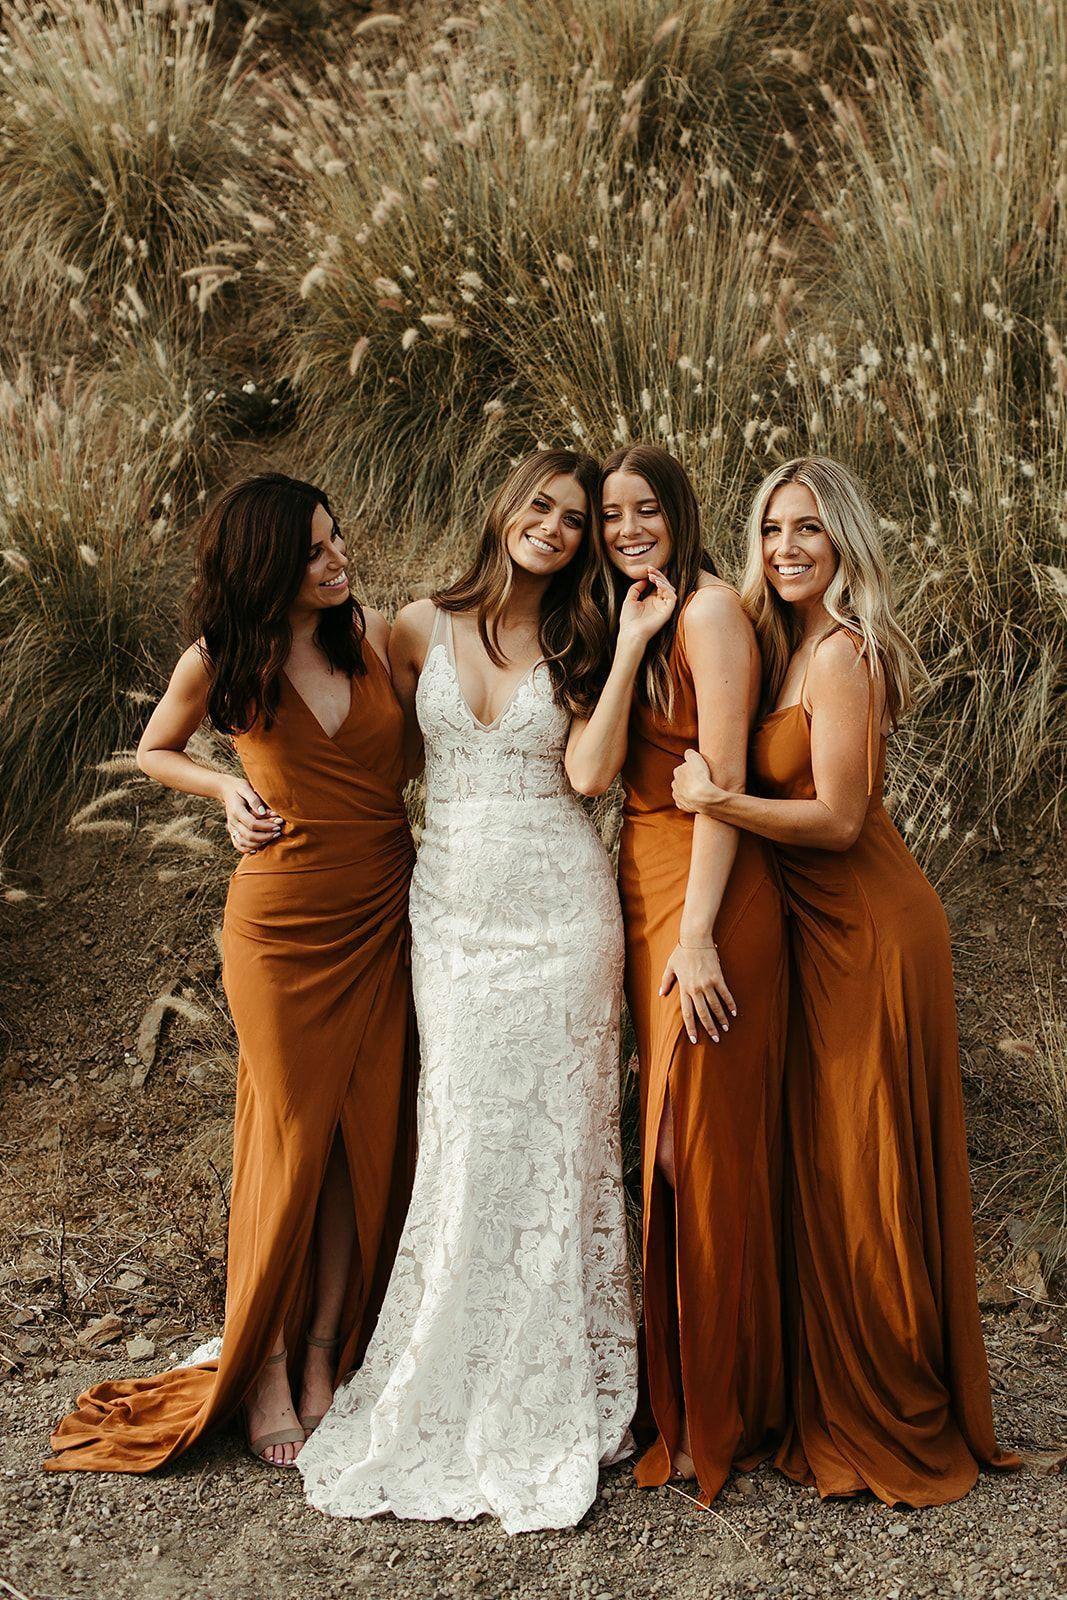 Bridesmaid Dresses Whip Smart Guide To Start Right Here Bohemian Bridesmaid Dress Orange Bridesmaid Dresses Fall Bridesmaid Dresses [ 1600 x 1067 Pixel ]